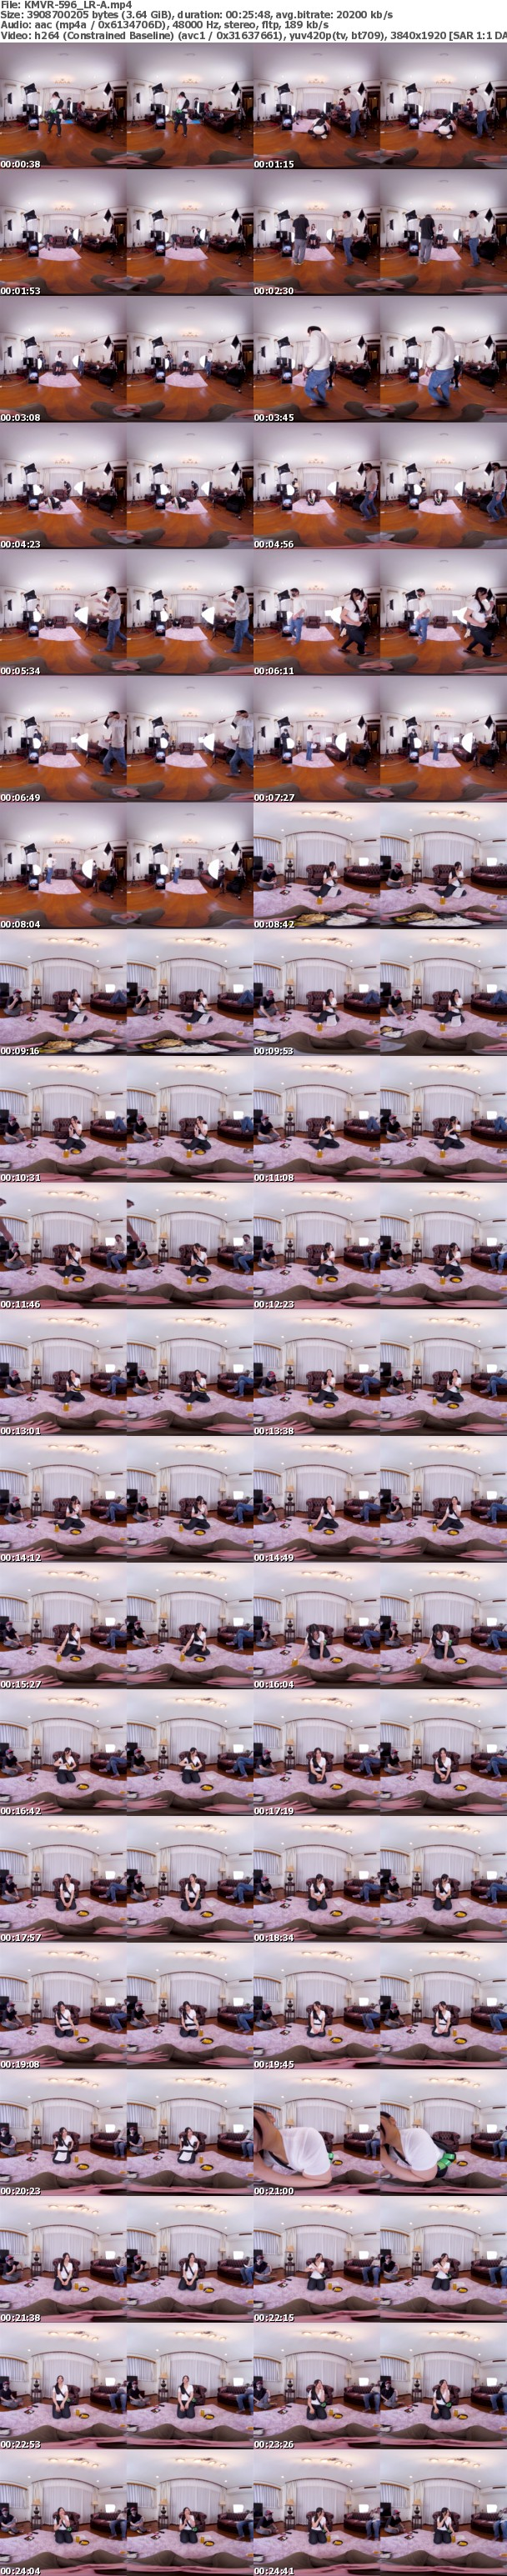 (VR) KMVR-596 【本当にあったHなAV体験談!】ピュアで可愛すぎる新人ADの現場奮闘記!「ホ…ホントにコレもするんですか…!?」初体験の連続で、お仕事中なのにエッチなスイッチが入ってしまい…。 川崎亜里沙